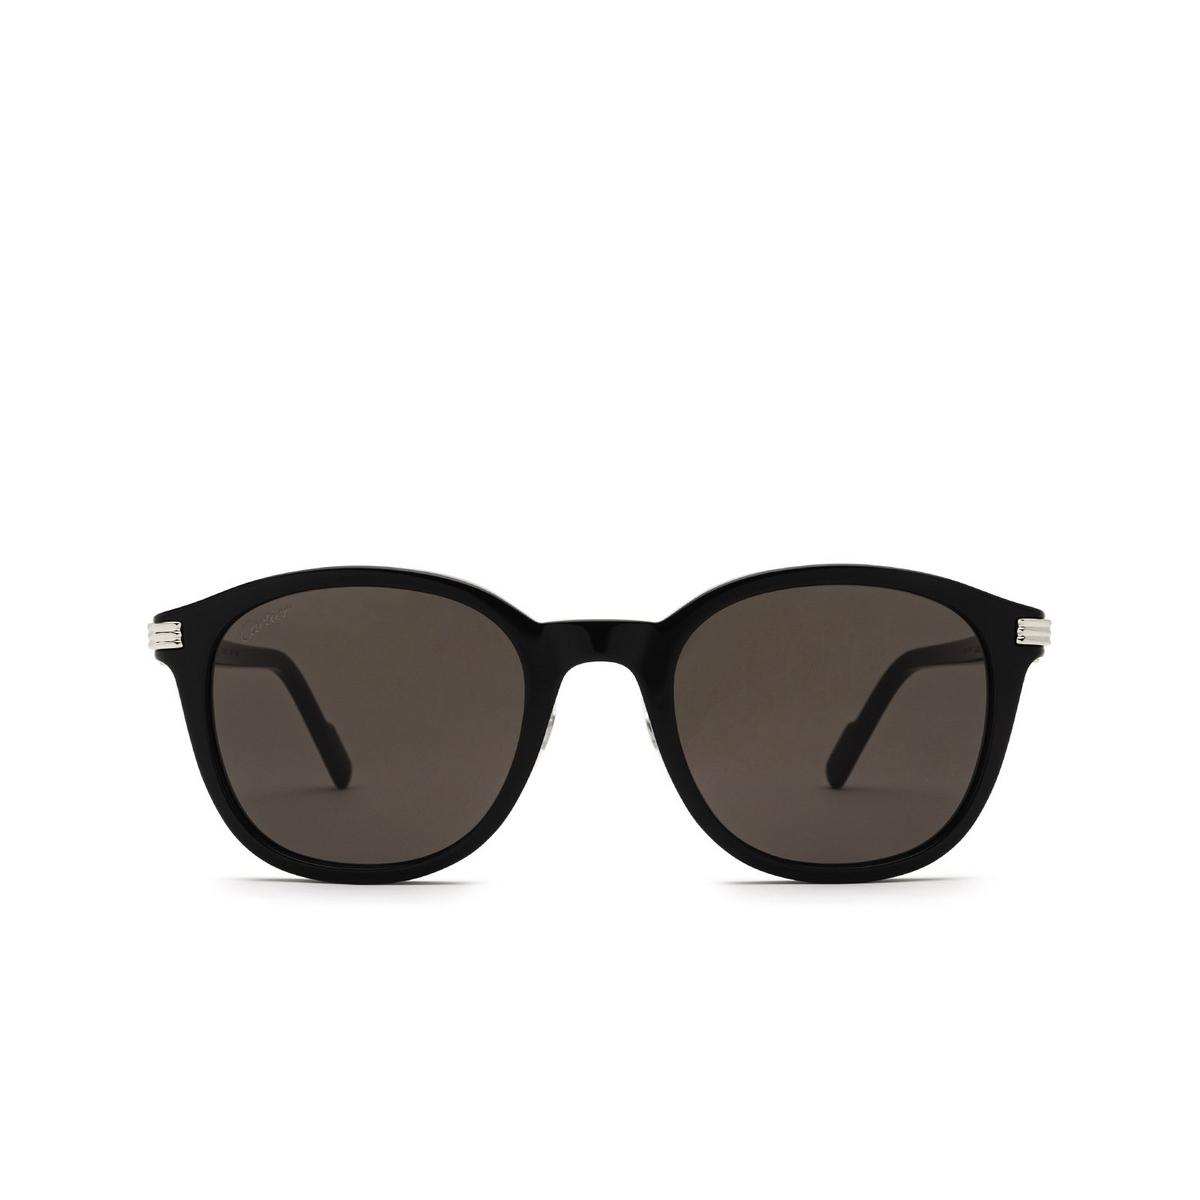 Cartier® Round Sunglasses: CT0302S color Black 005 - front view.